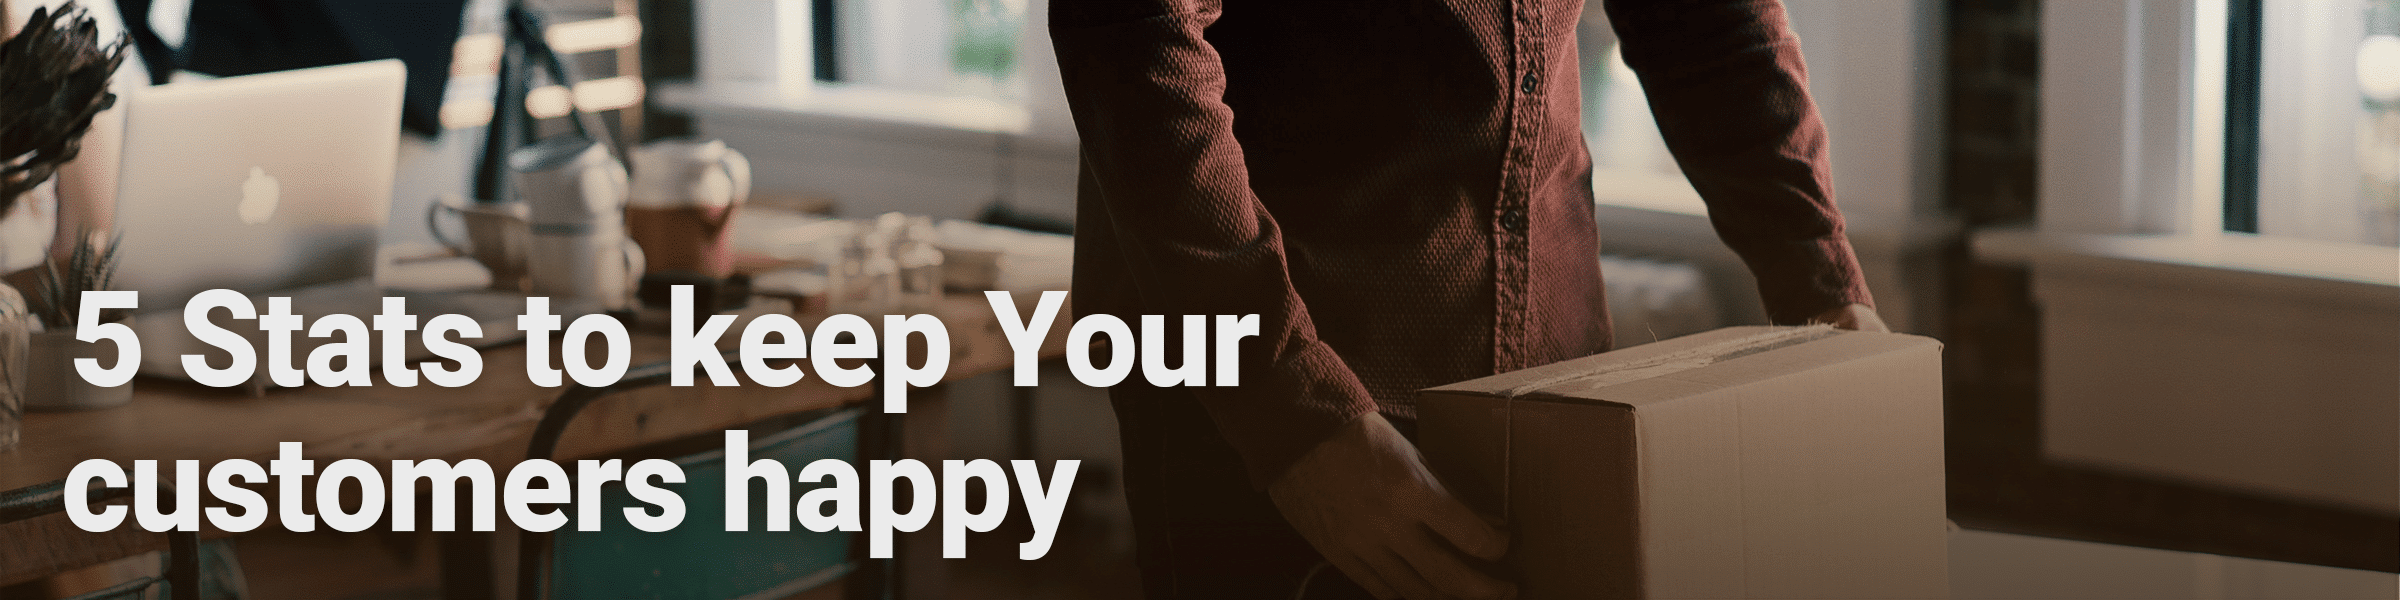 5 stats to keep your customers happy - bringoz